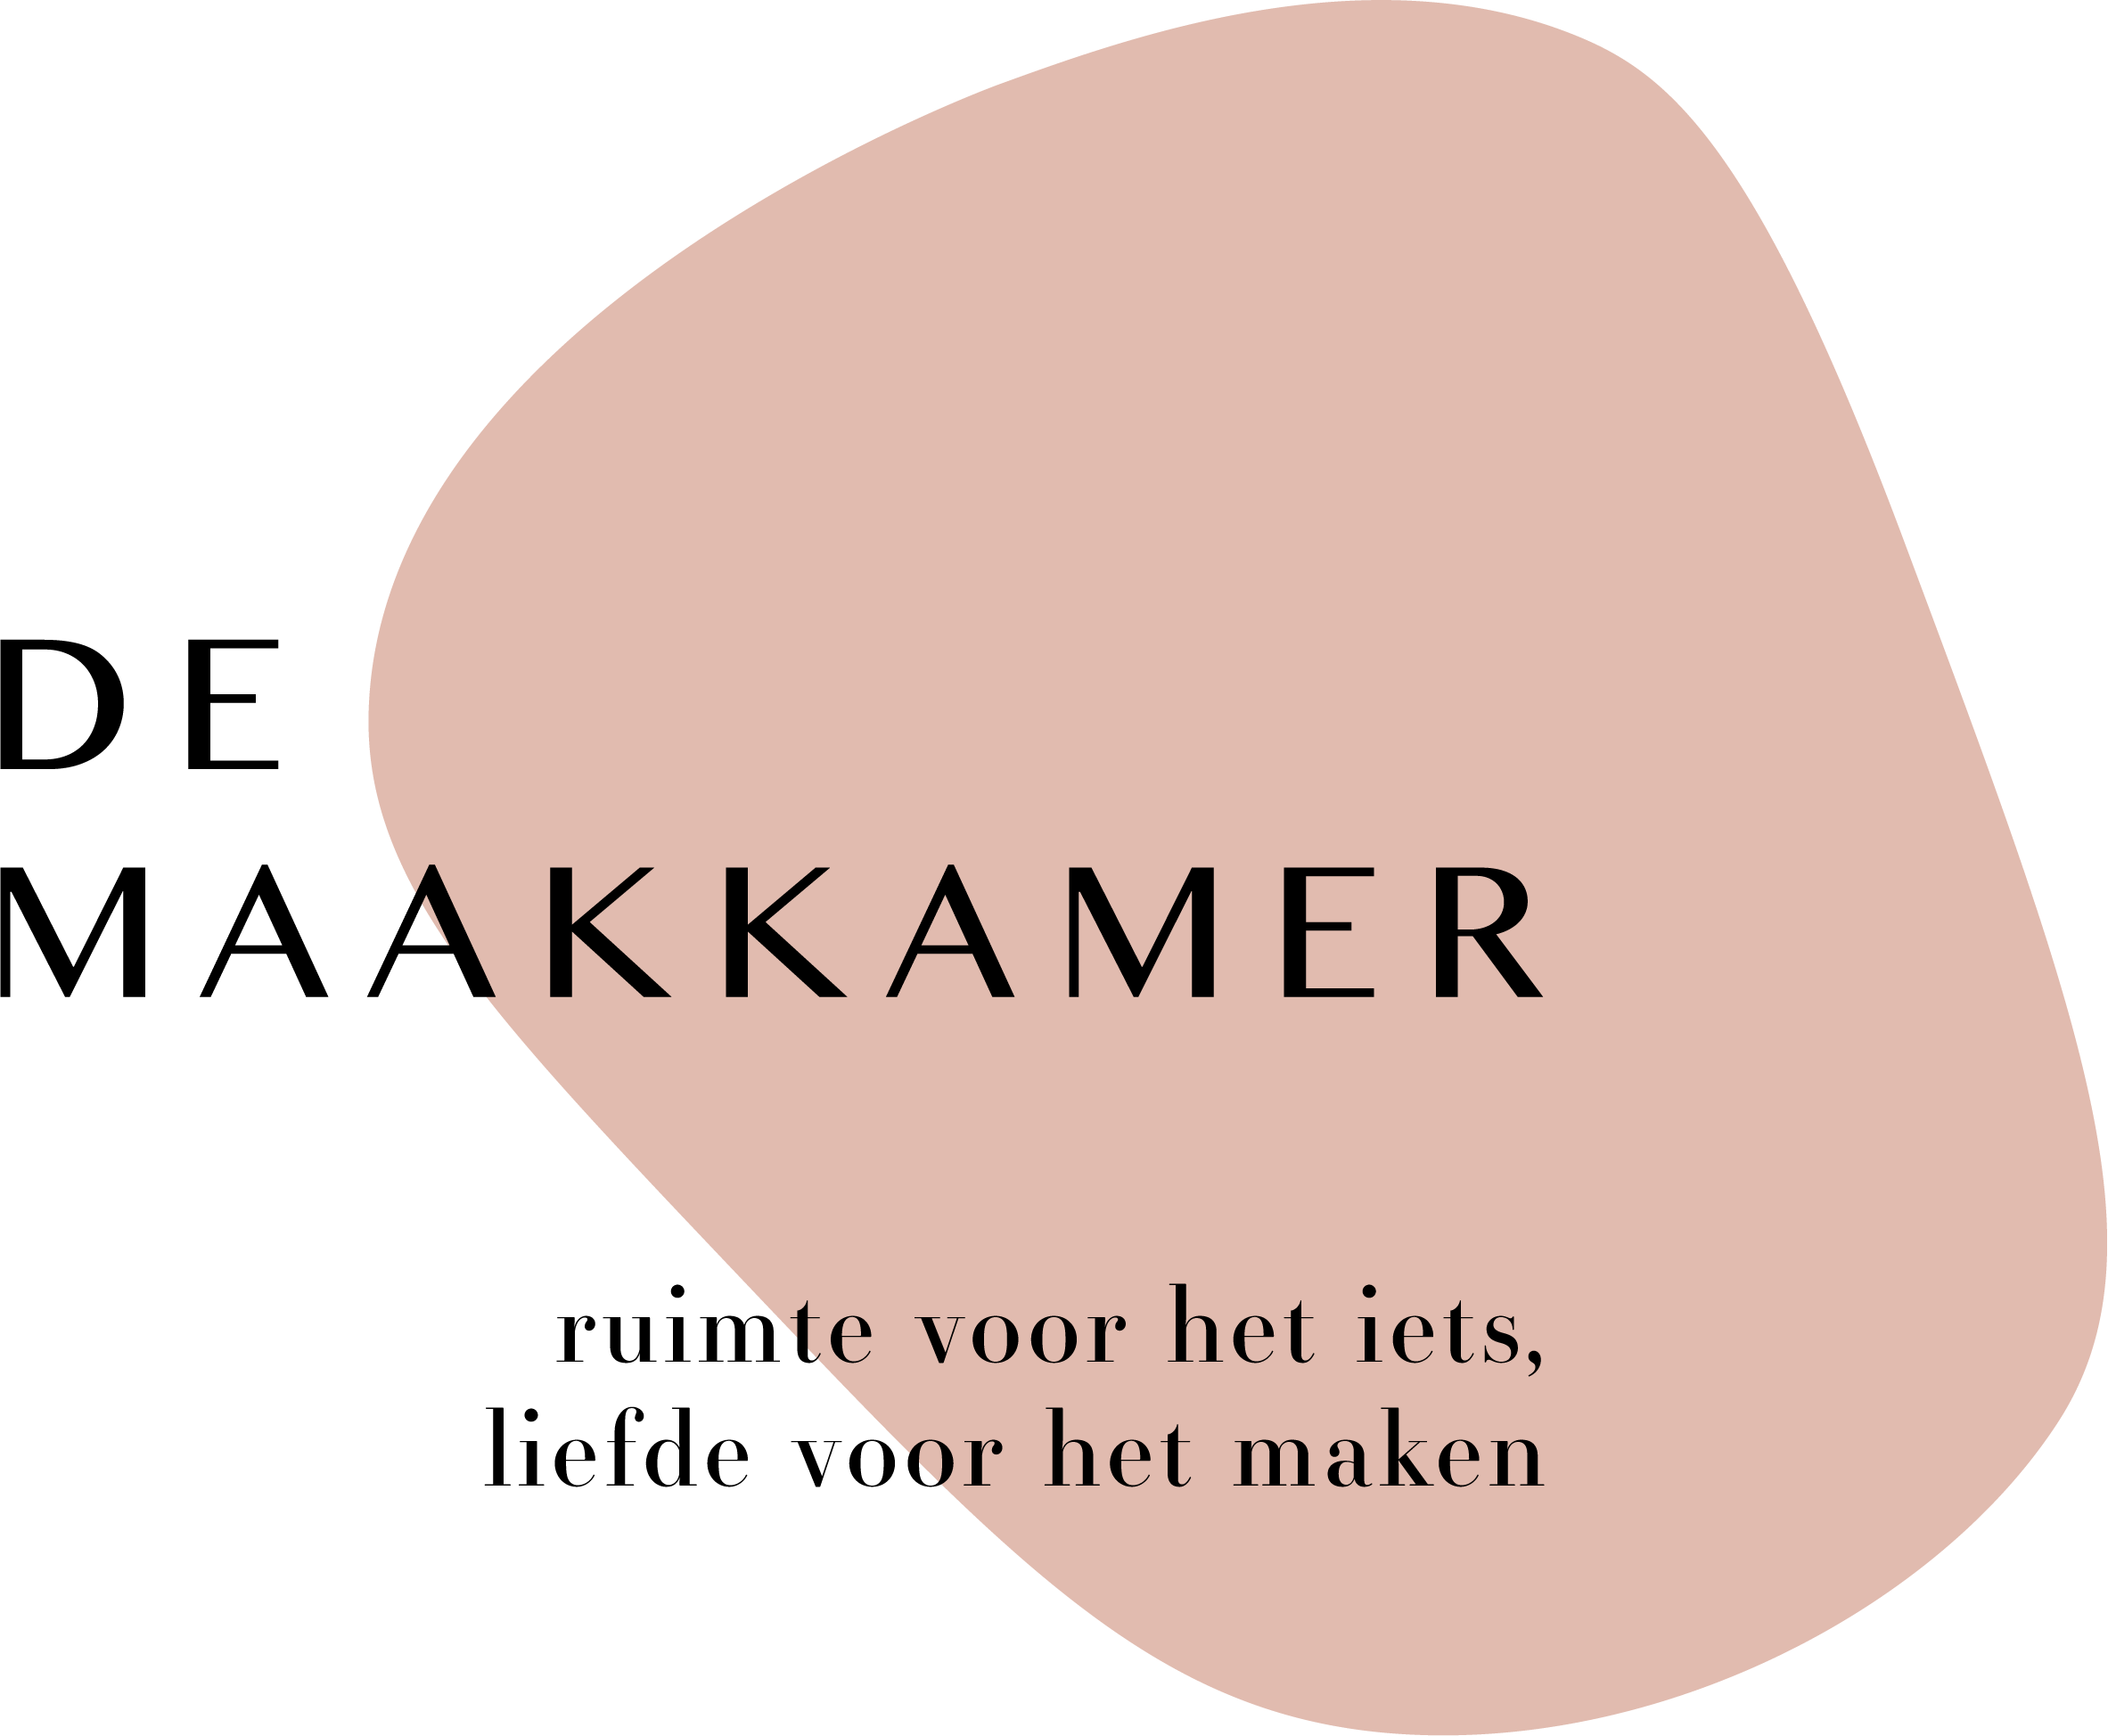 logo+onder-zwart+roze.png